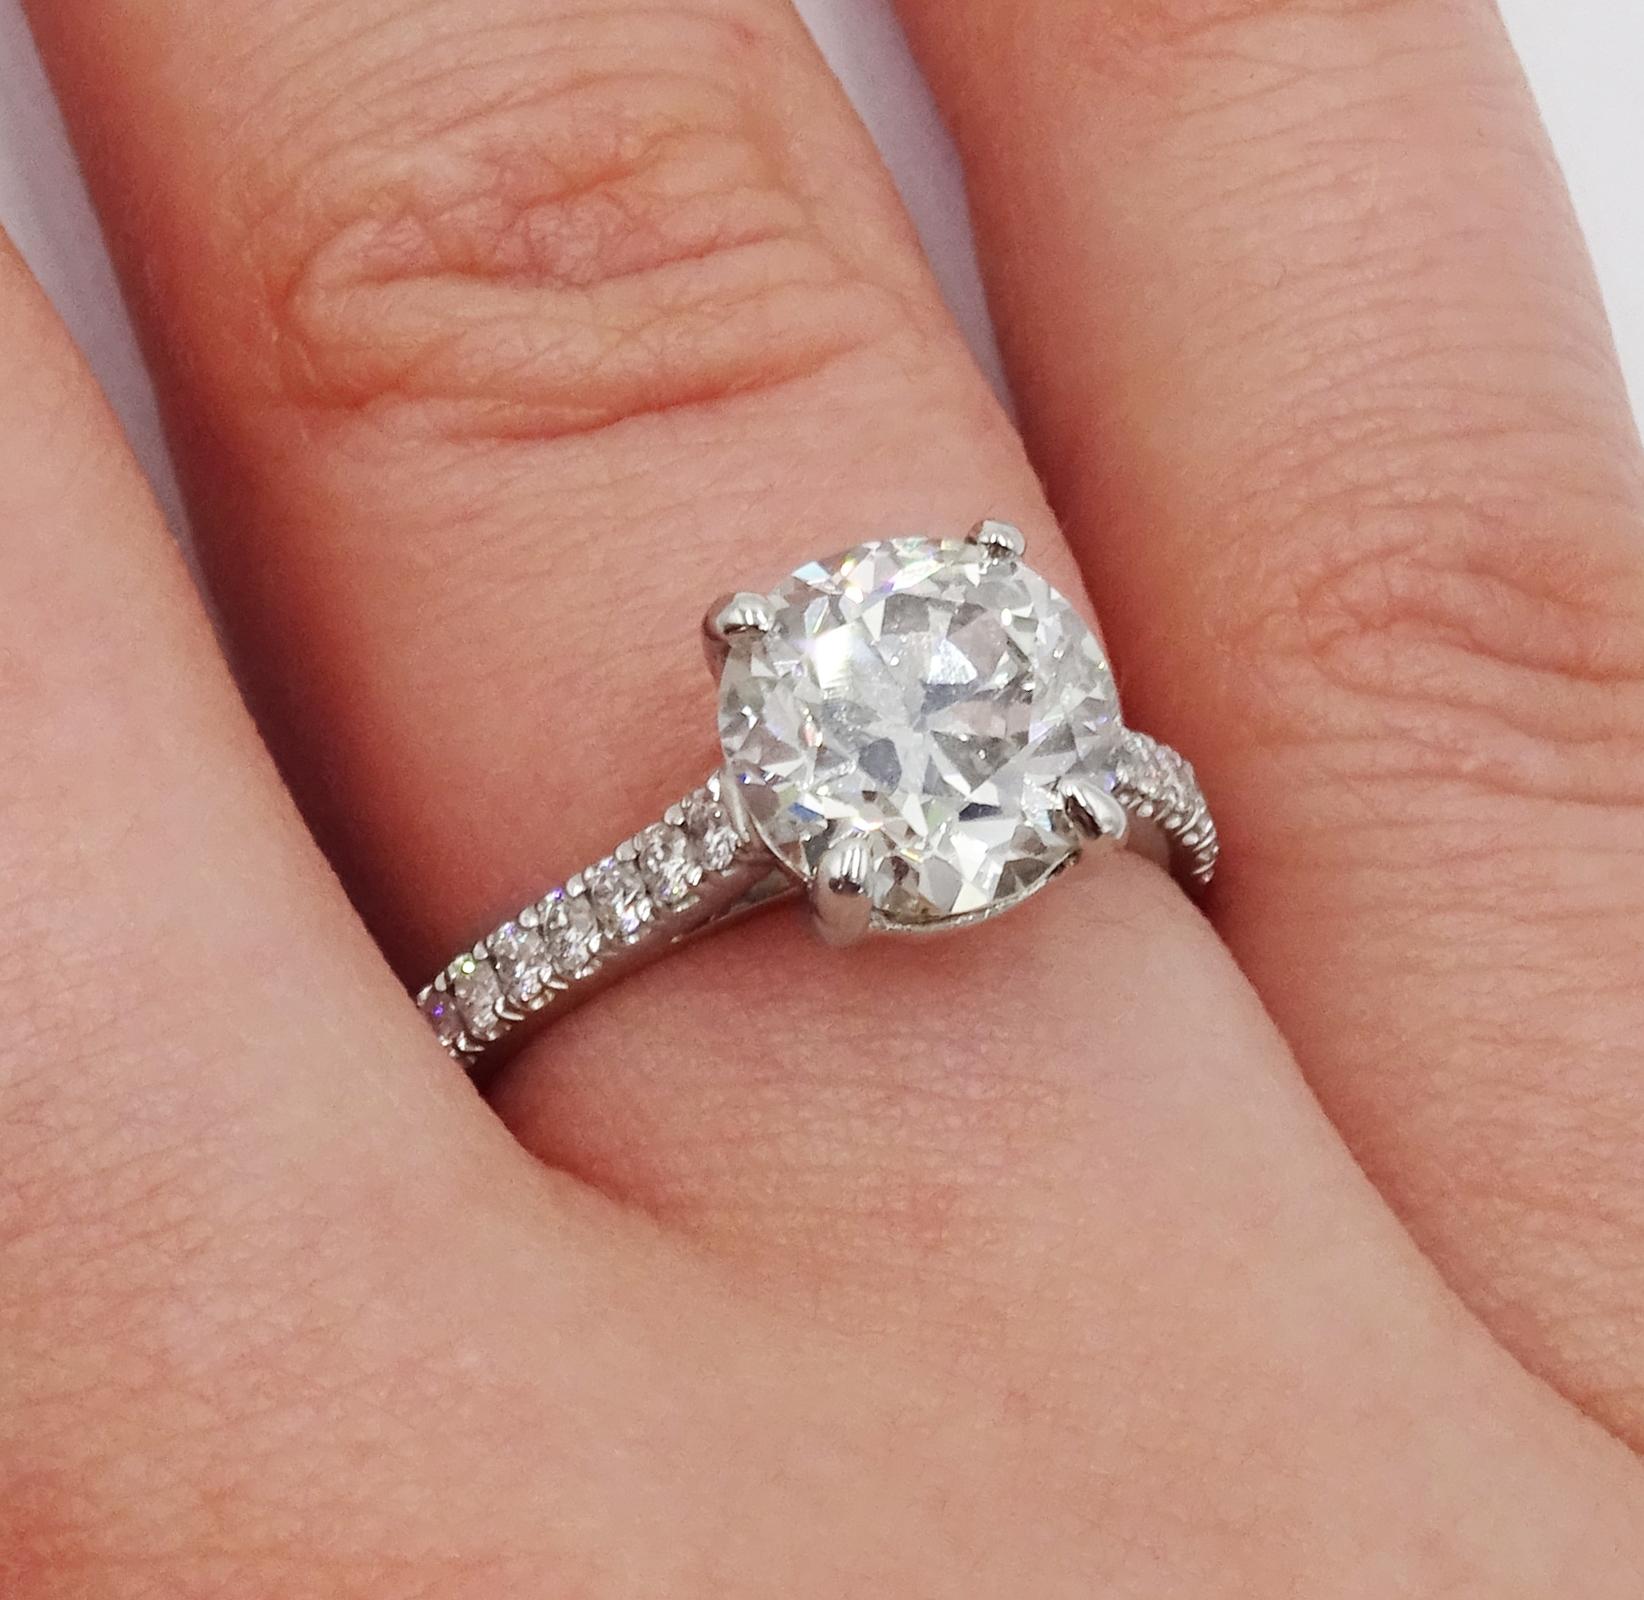 Platinum old cut diamond solitaire ring - Image 2 of 9